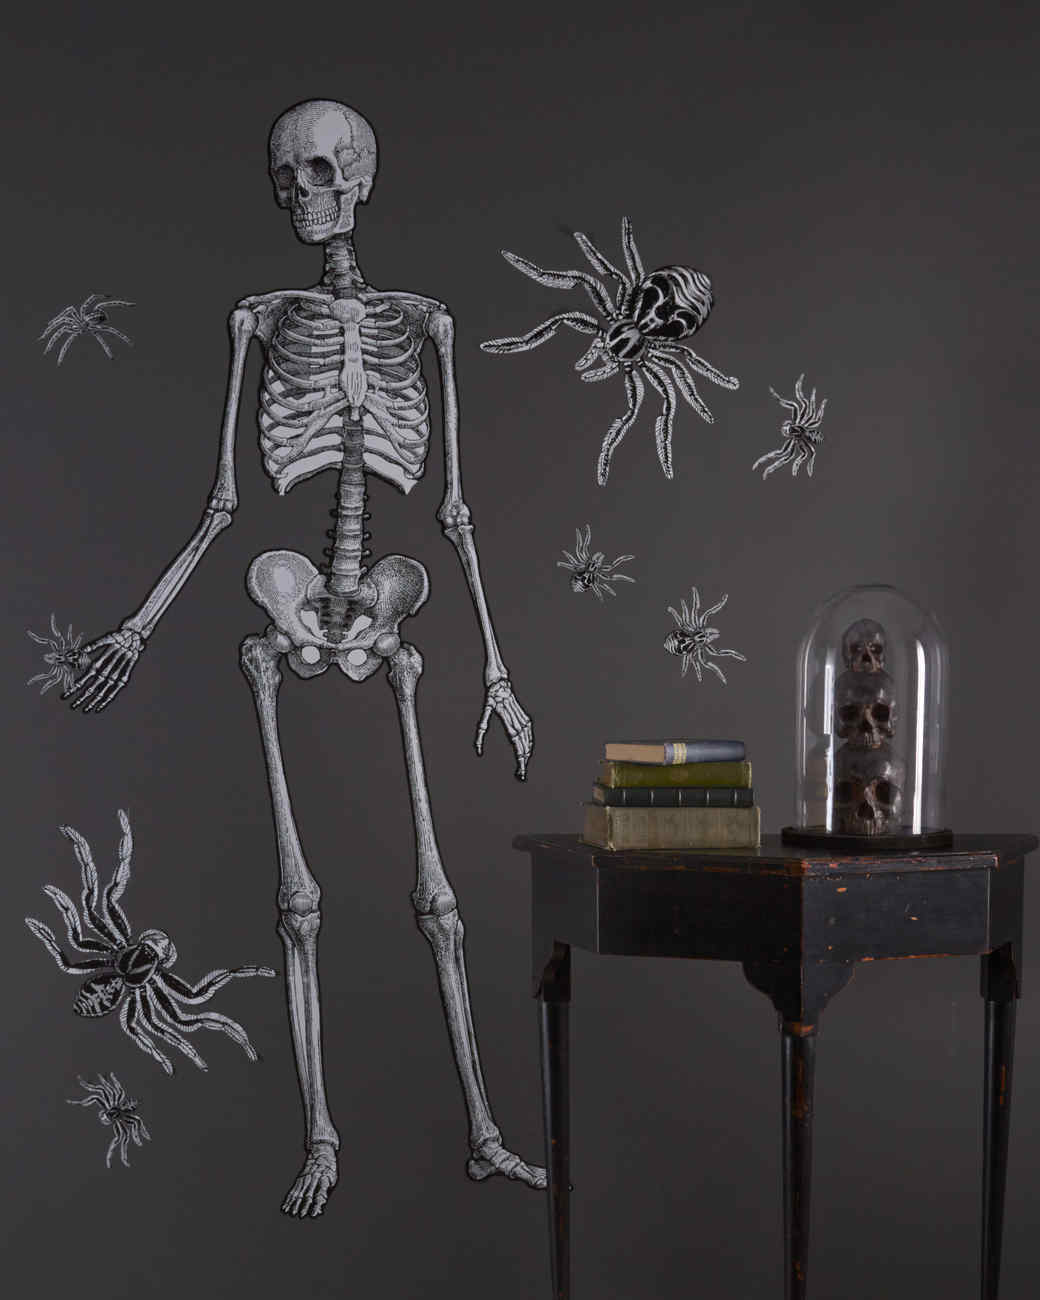 home-decorators-collection-2693-d112528.jpg